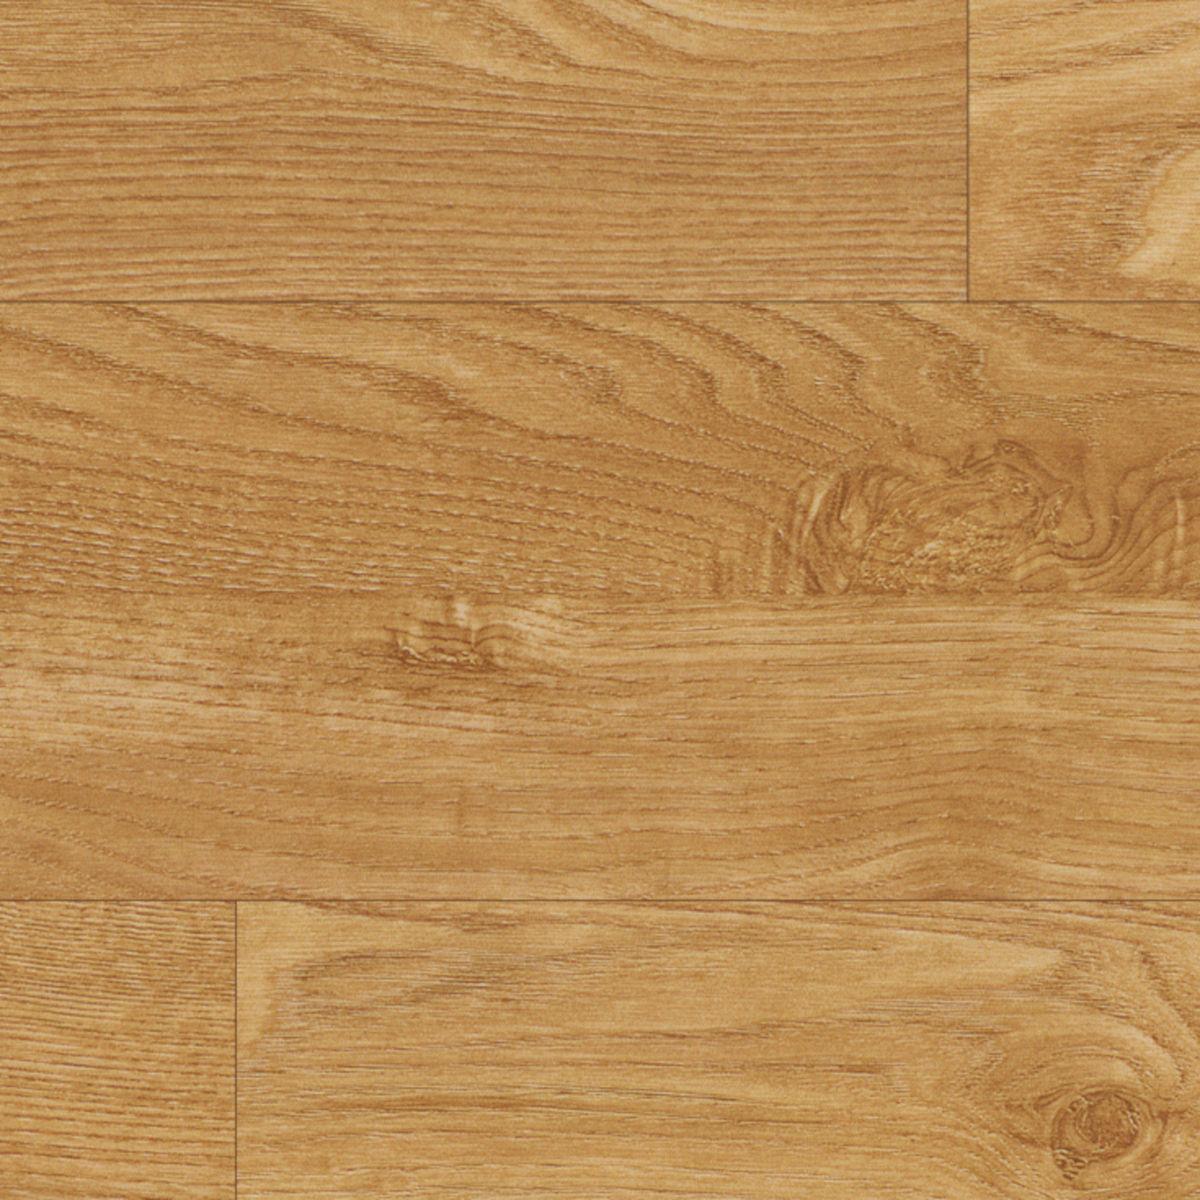 Karndean knight tile american oak for Flooring america